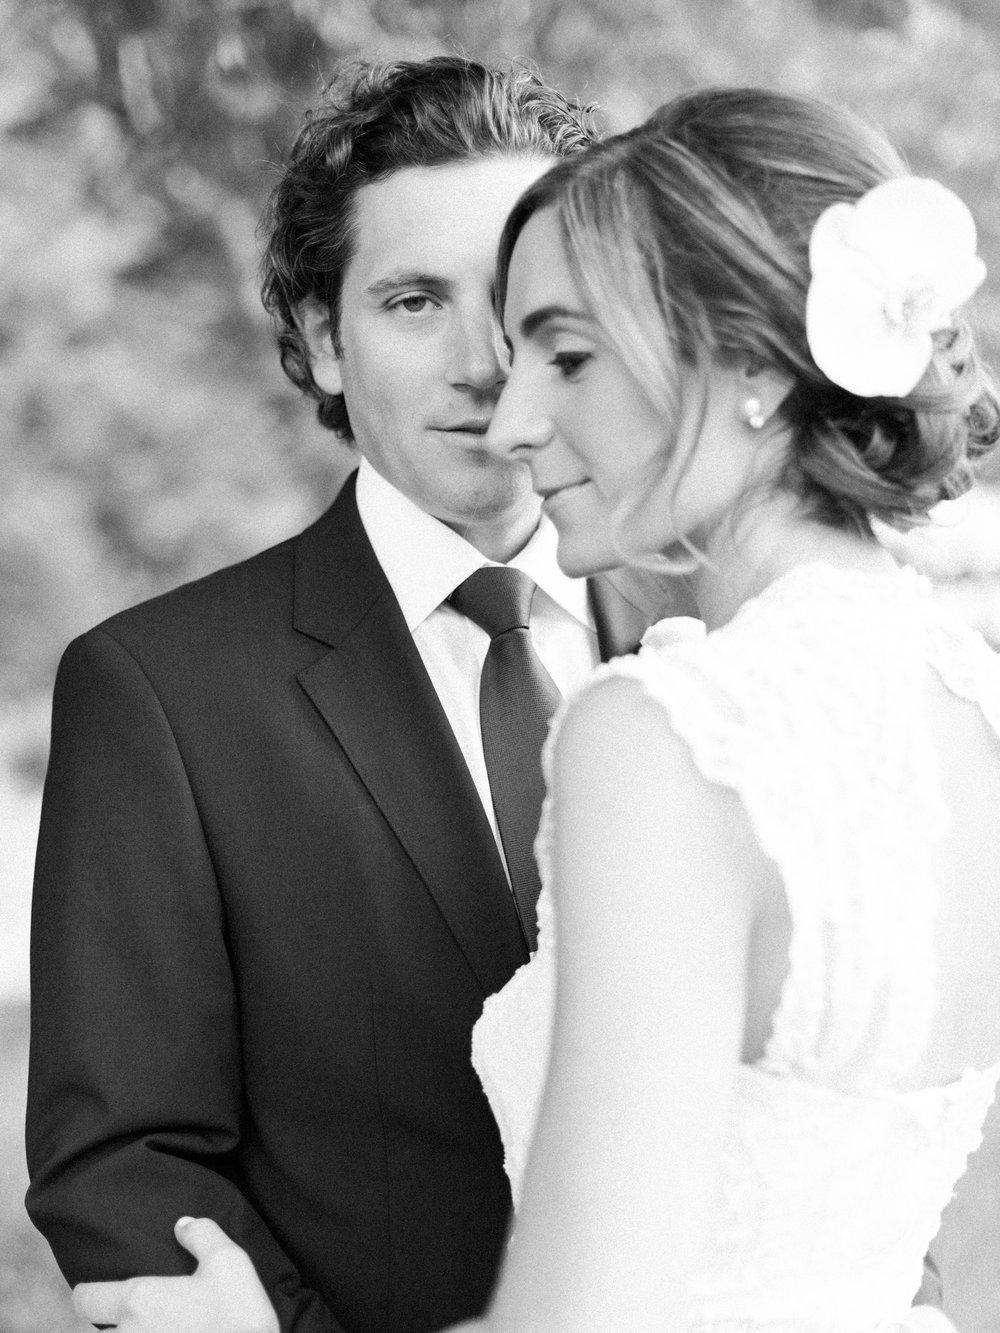 Omni William Penn Resort Wedding Pittsburgh Wedding Photographer Anna Laero Burgh Bride-22-3.jpg